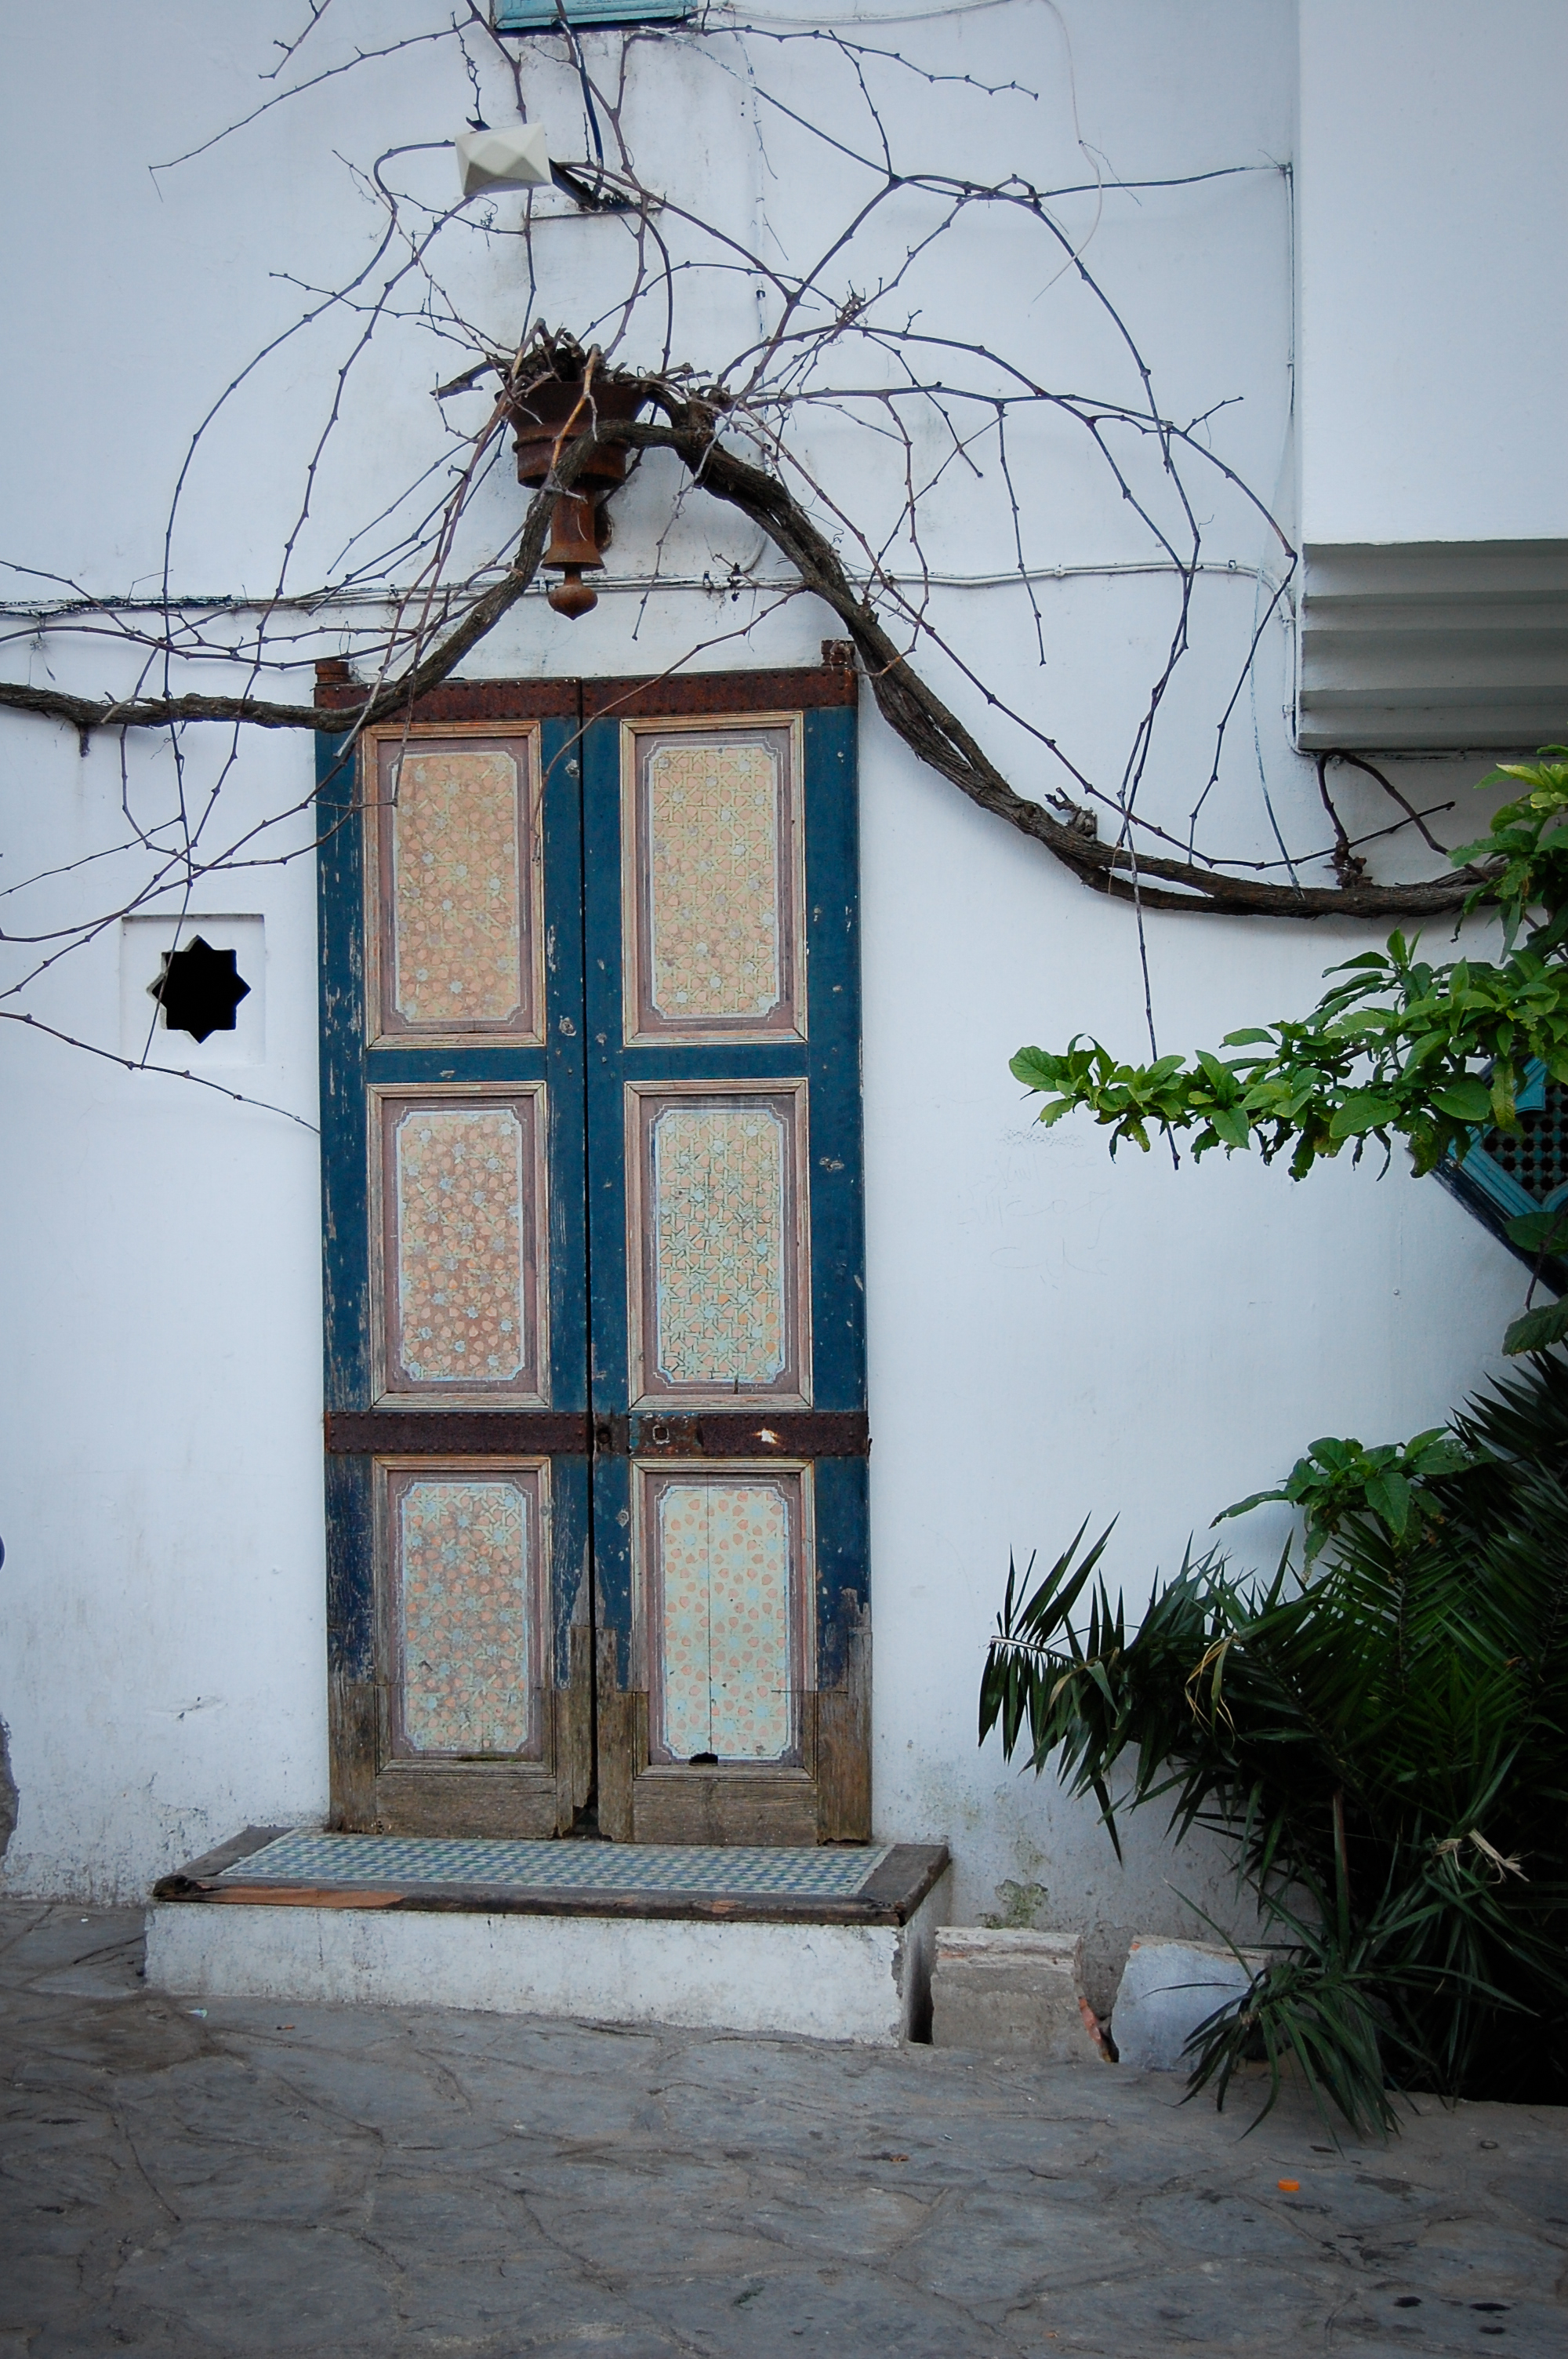 morocco (10 of 39).jpg